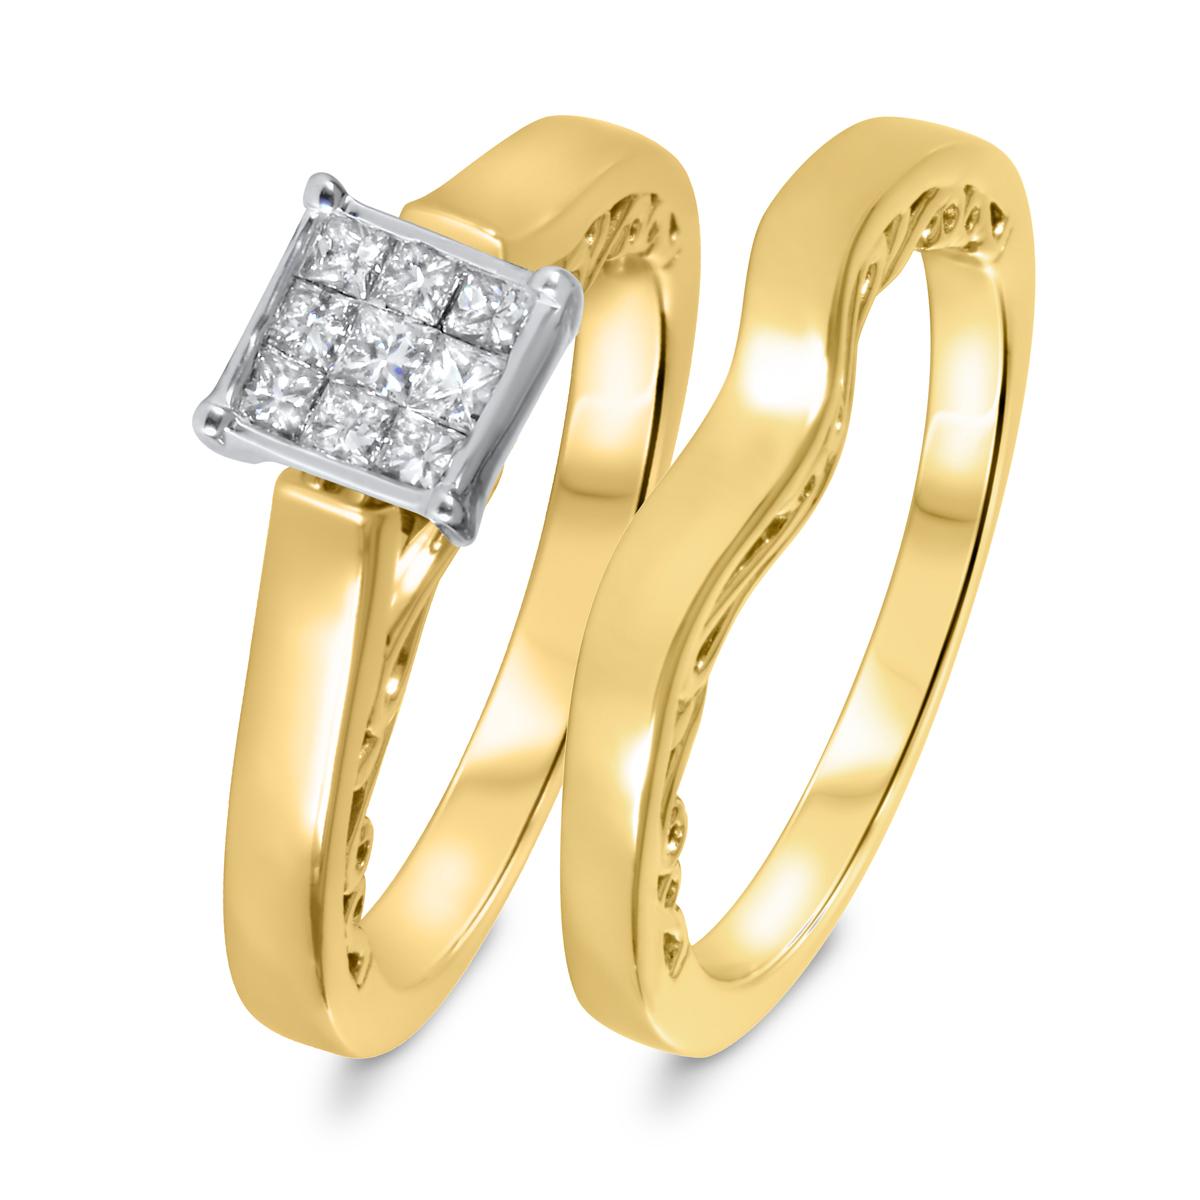 1/3 CT. T.W. Diamond Women's Bridal Wedding Ring Set 10K Yellow Gold